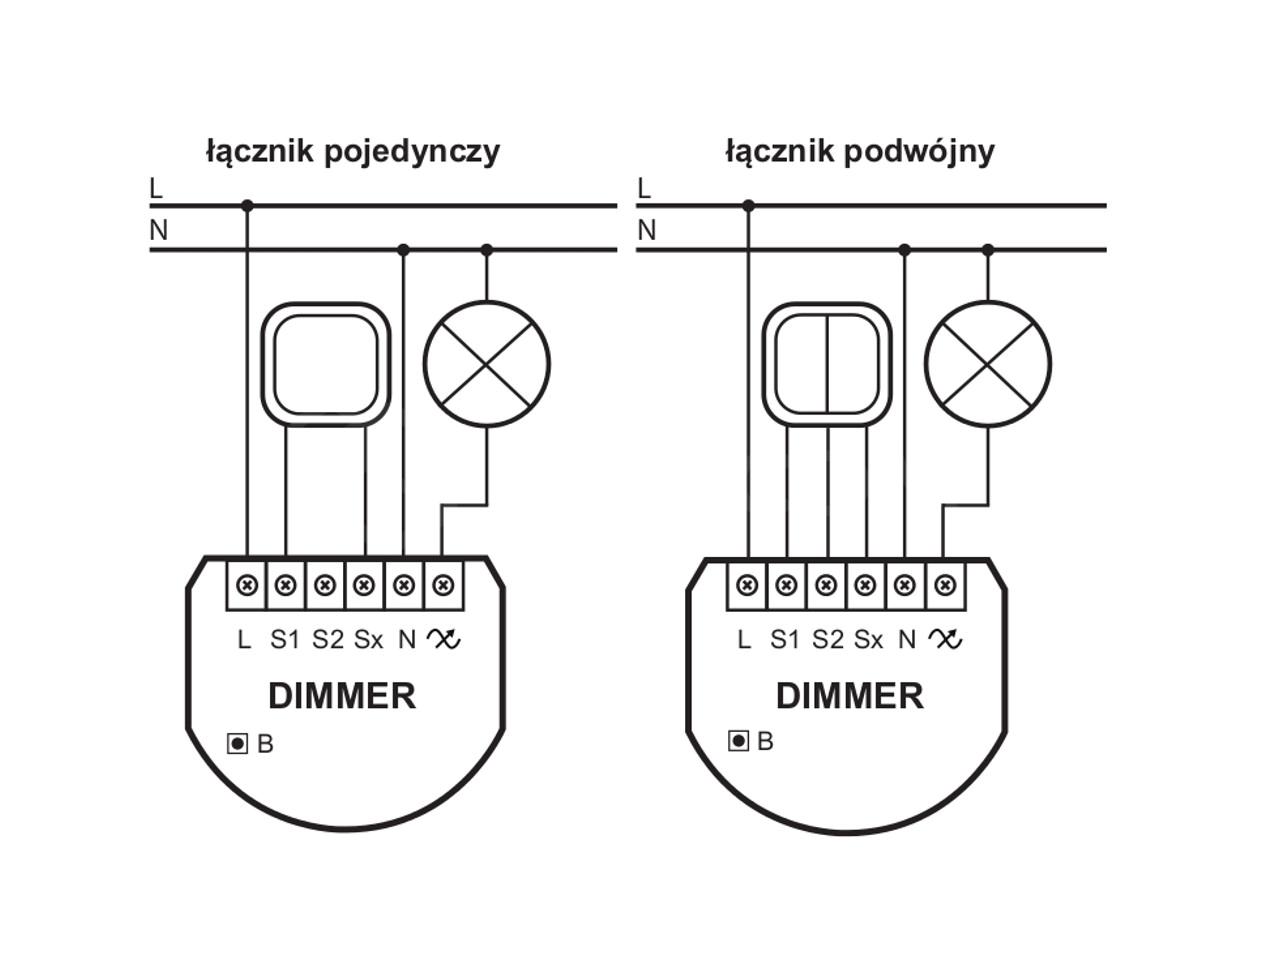 wiring diagram 3 wire connection ga3255 9665 fibaro dimmer 2 (250w) fibaro dimmer 2 wiring diagram at edmiracle.co